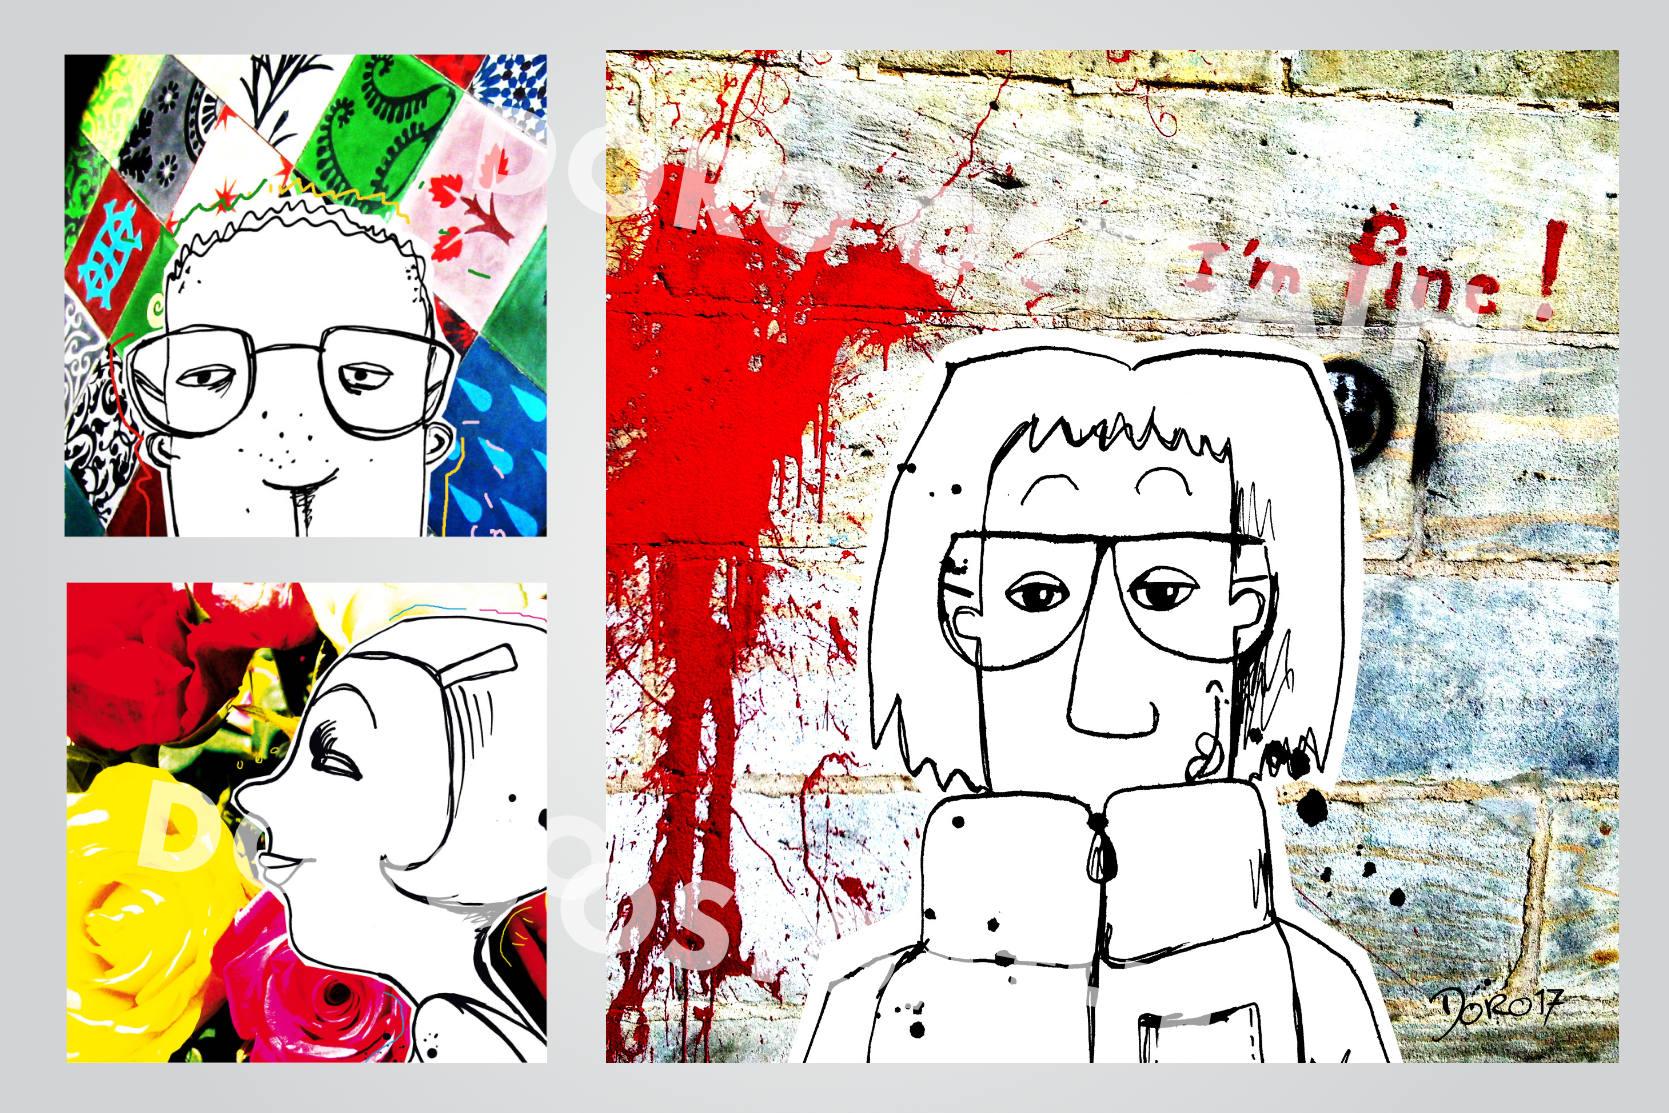 illustration-kunst-art-ostgathe-04.jpg